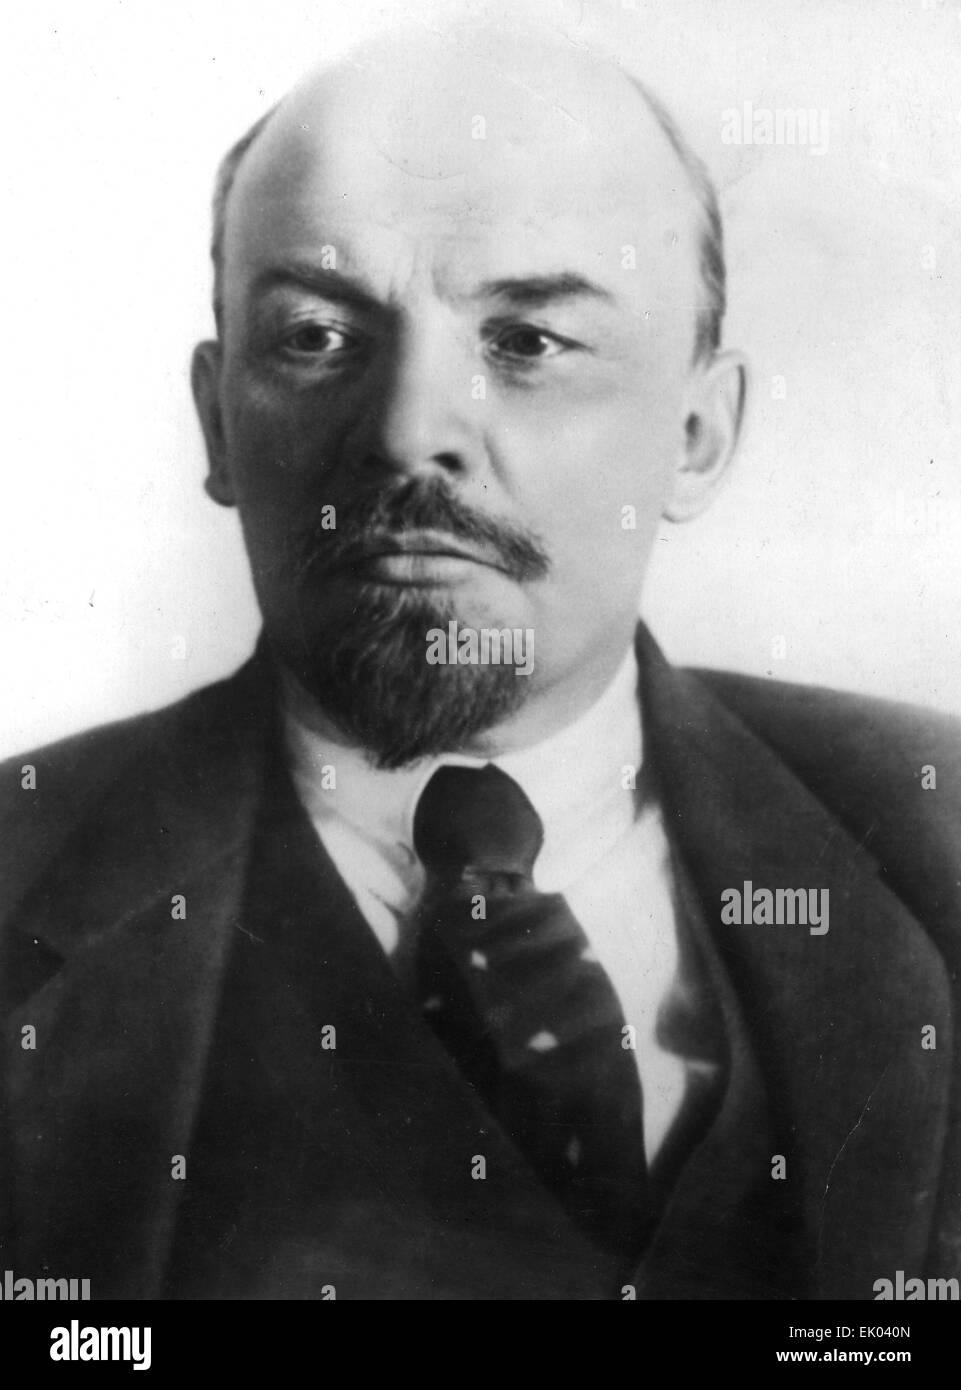 VLADIMIR LENIN (1870-1924) Russian Marxist revolutionary about 1918 - Stock Image